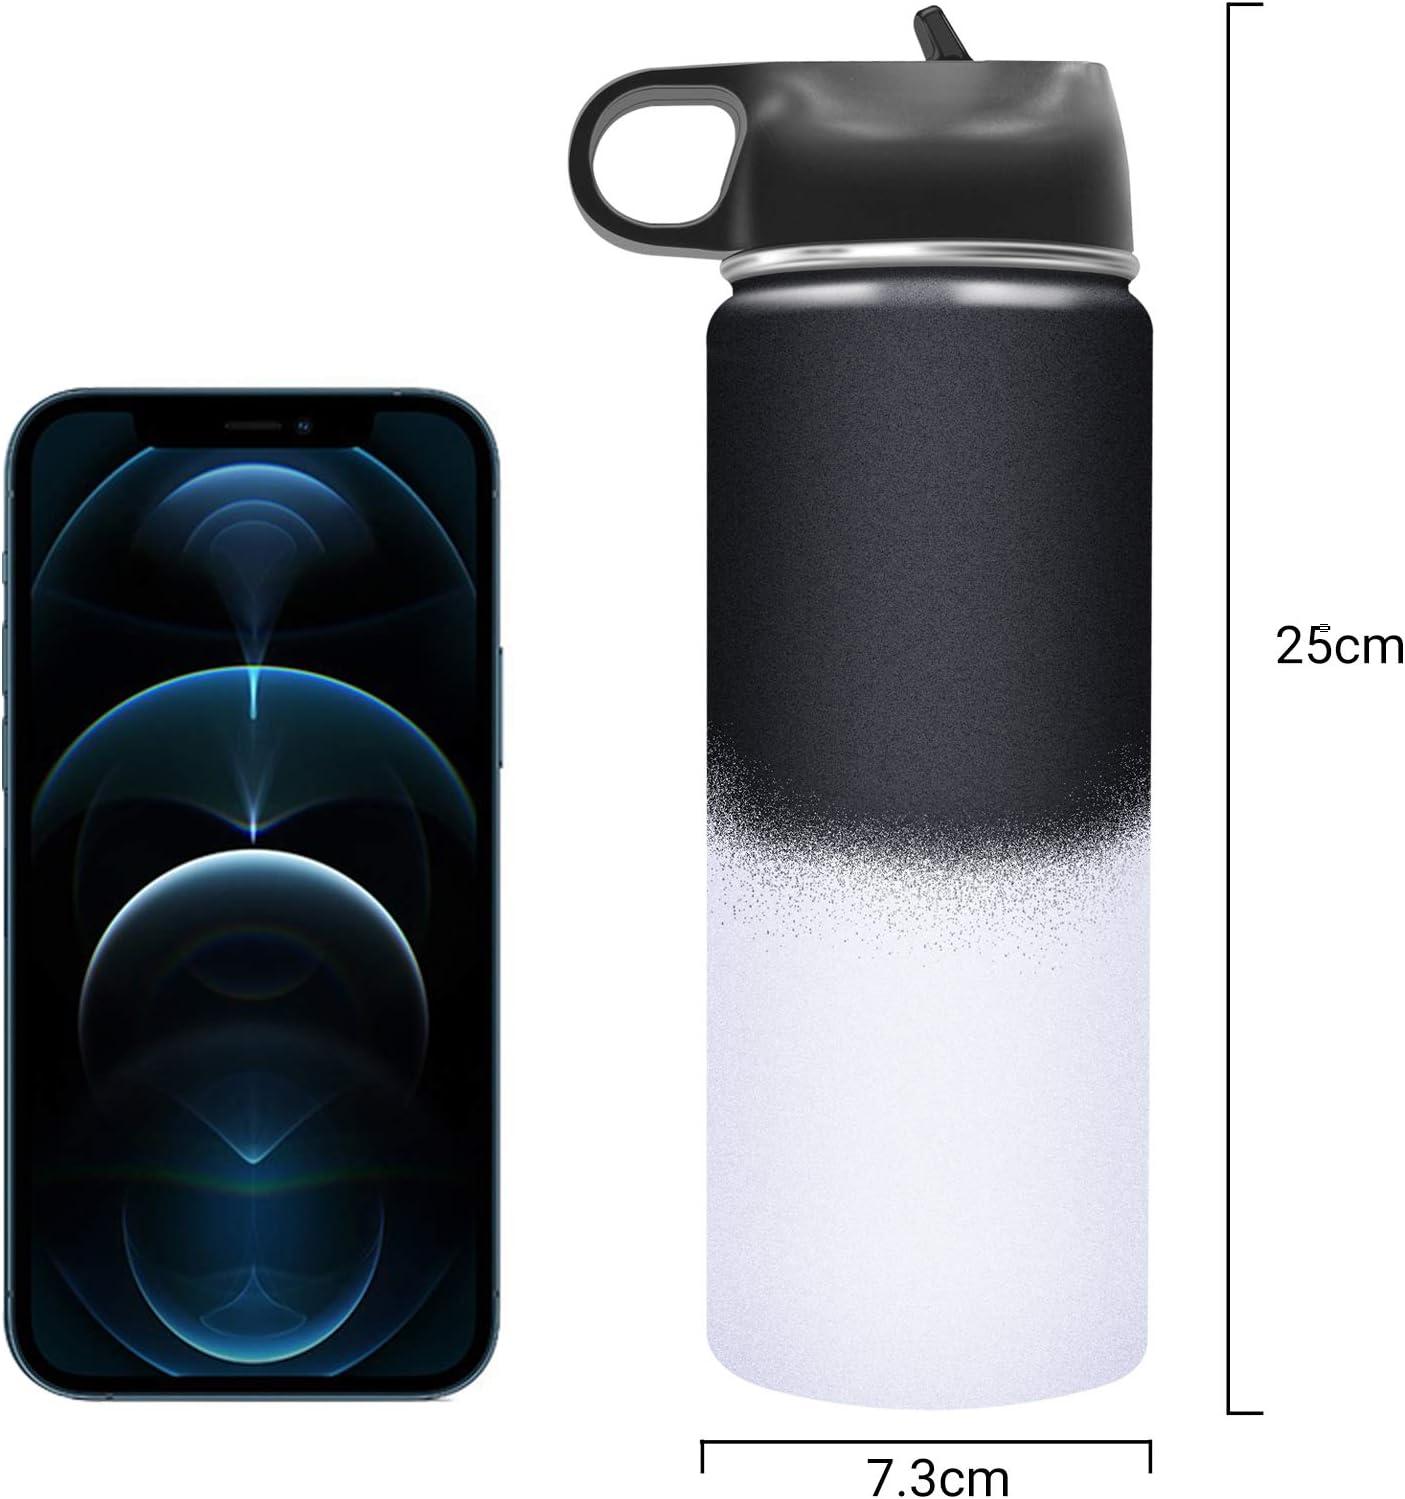 BICASLOVE Botella de Agua Acero Inoxidable 18oz/532ml,Aislamiento de Vacío de Doble Pared,Reutilizable,para ...